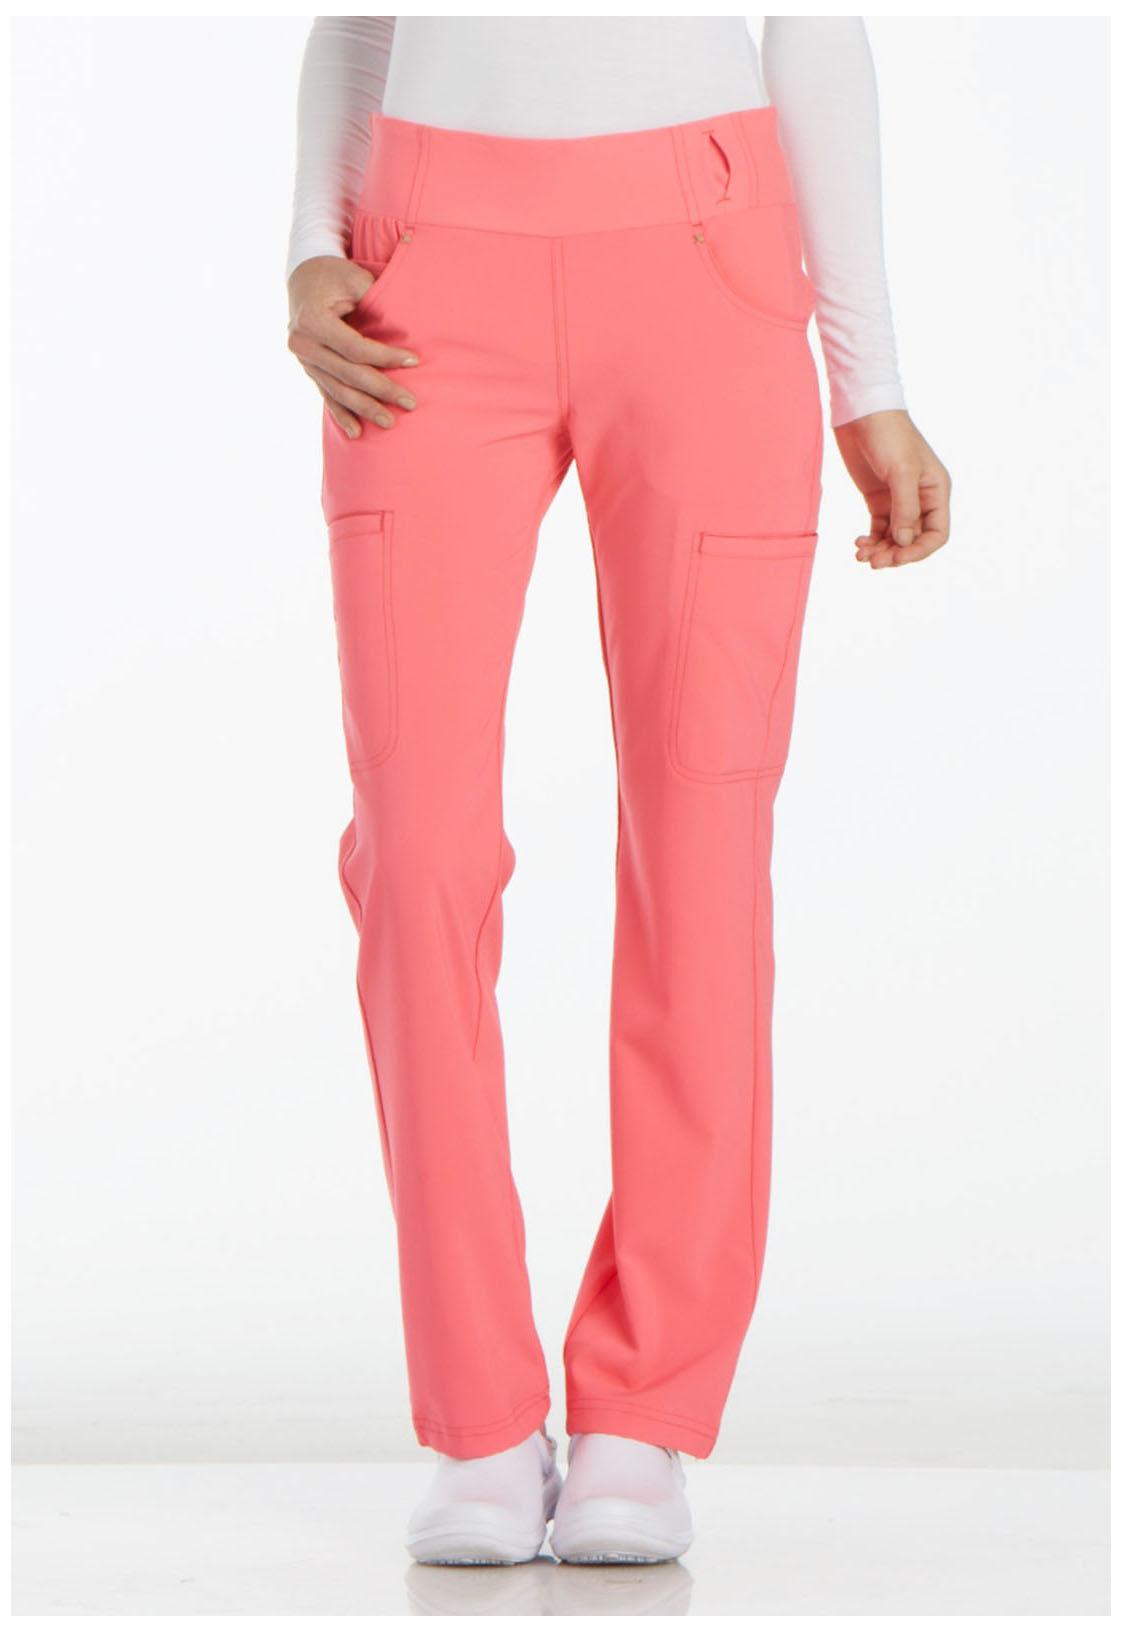 7abfa15c97d iFlex Mid Rise Straight Leg Pull-on Pant in Karma Pink CK002-KAPK ...